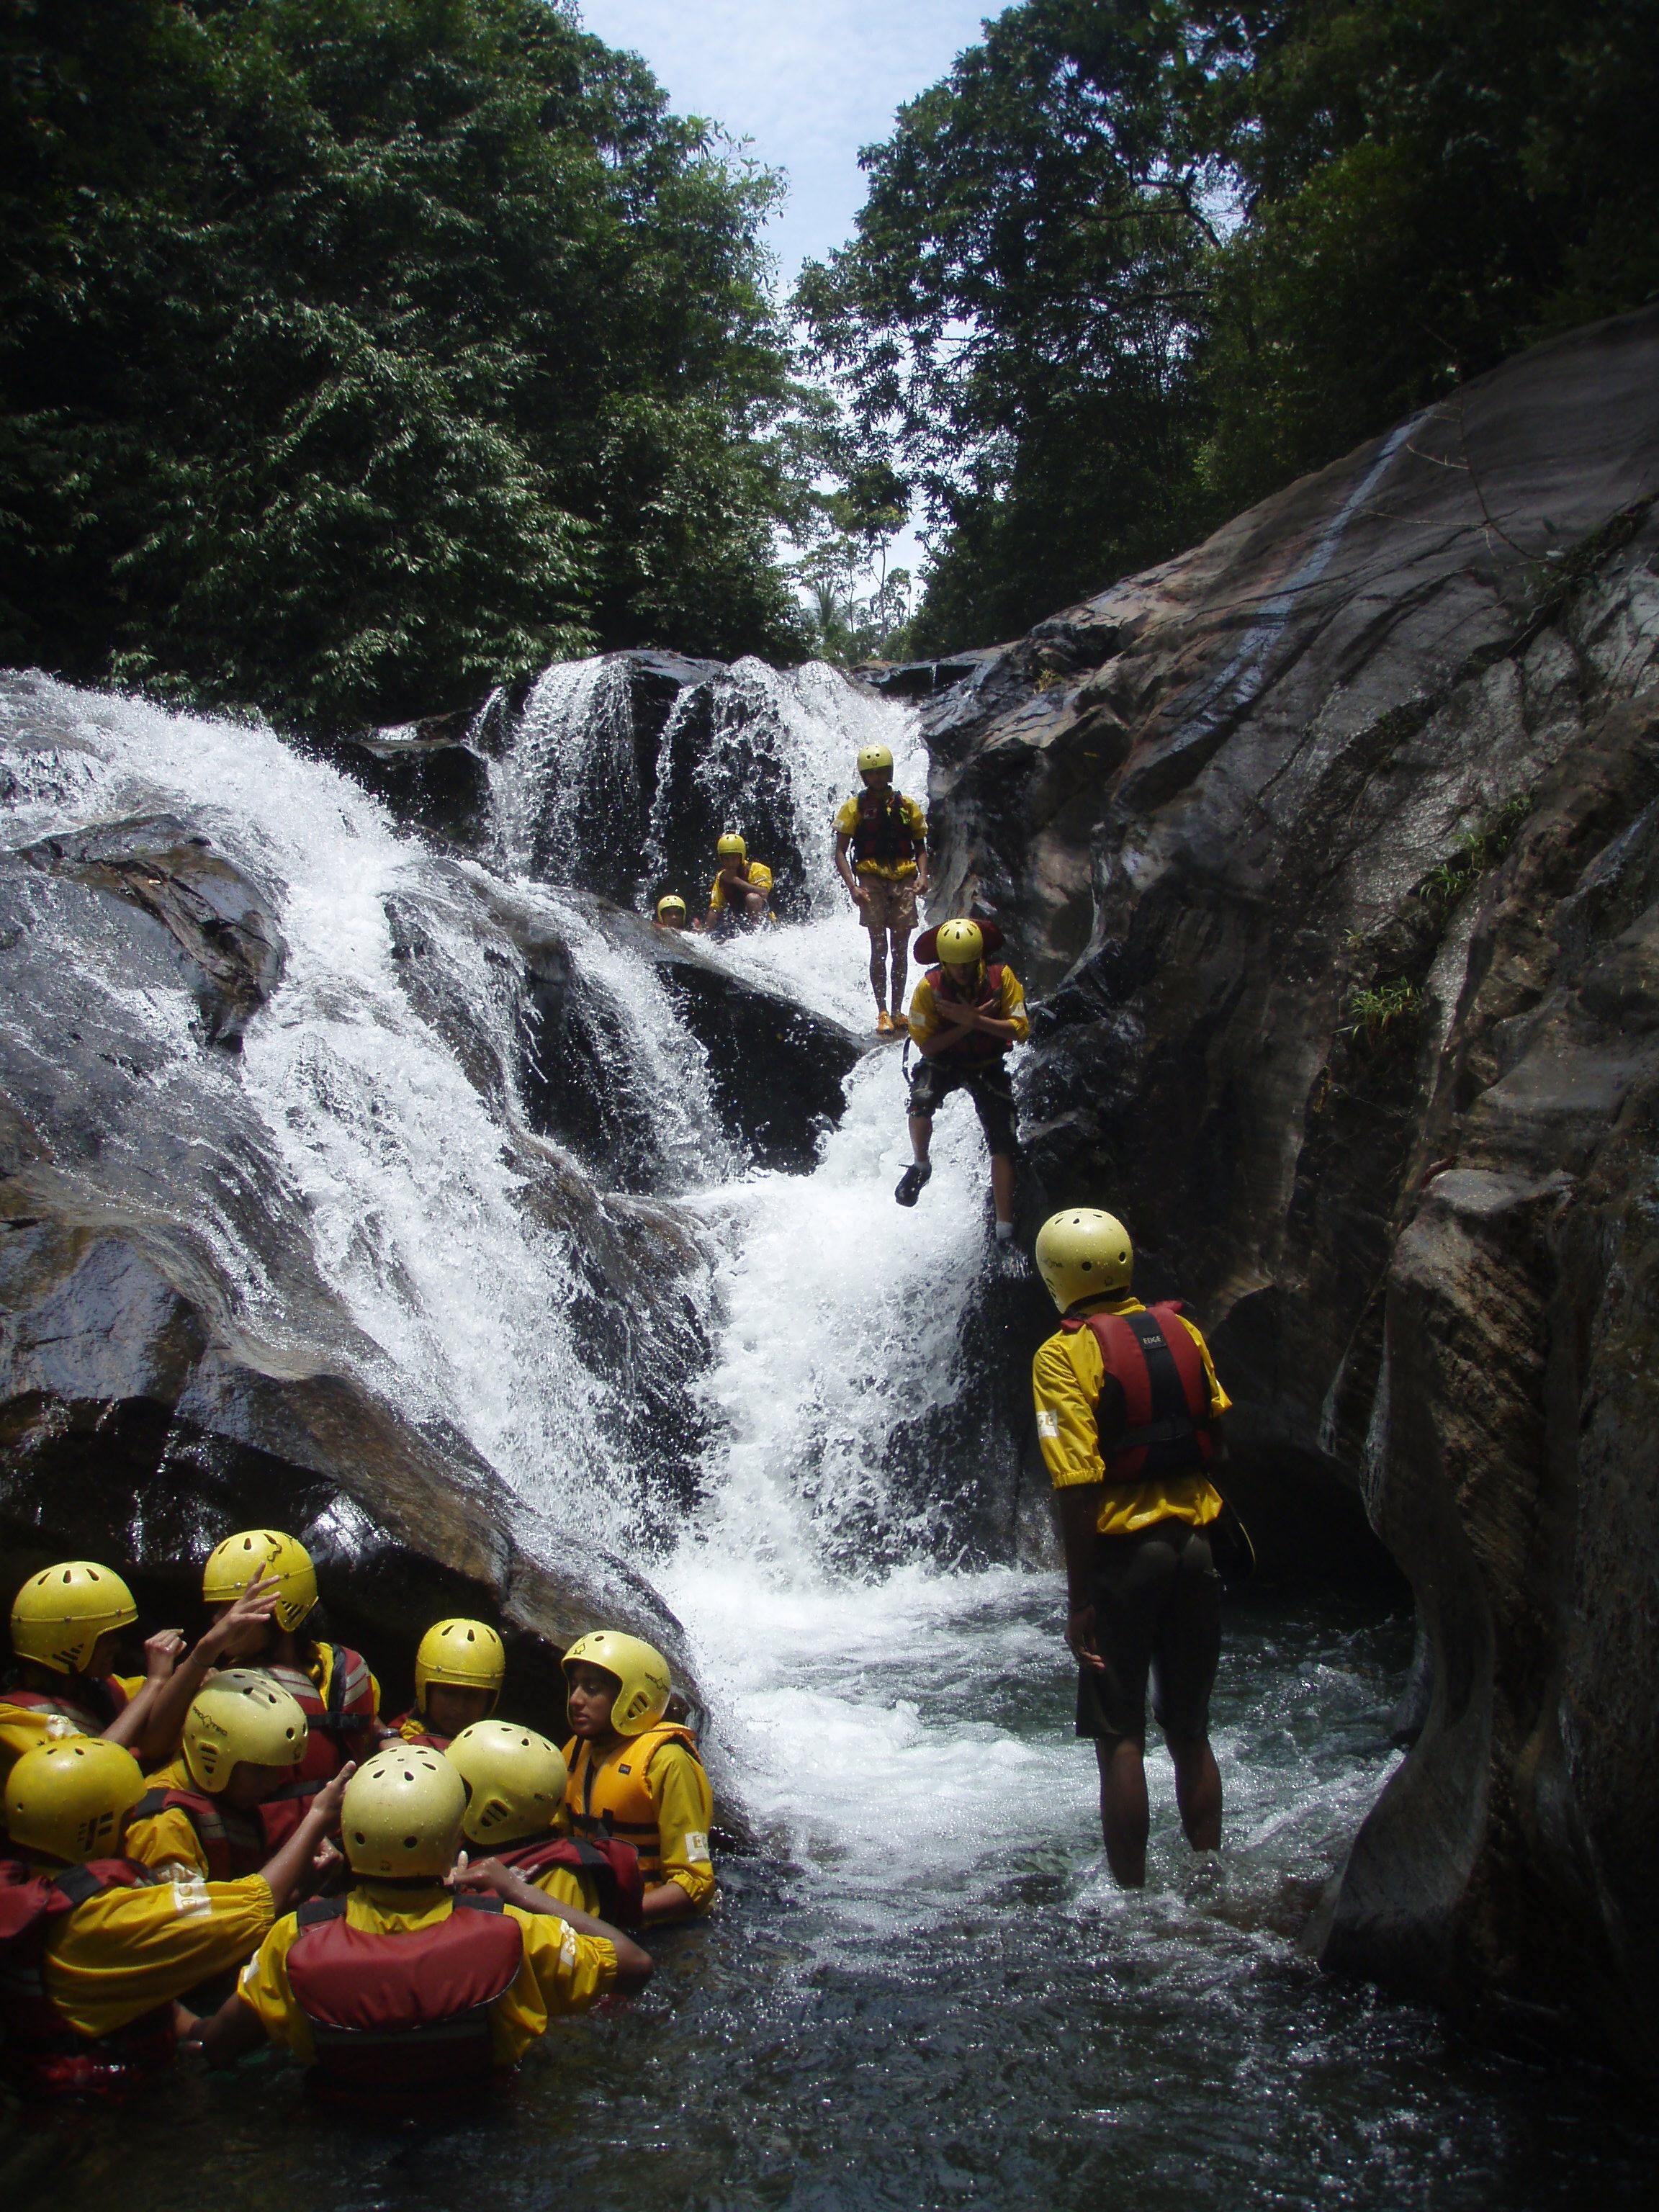 Canyoning in Kithulgala